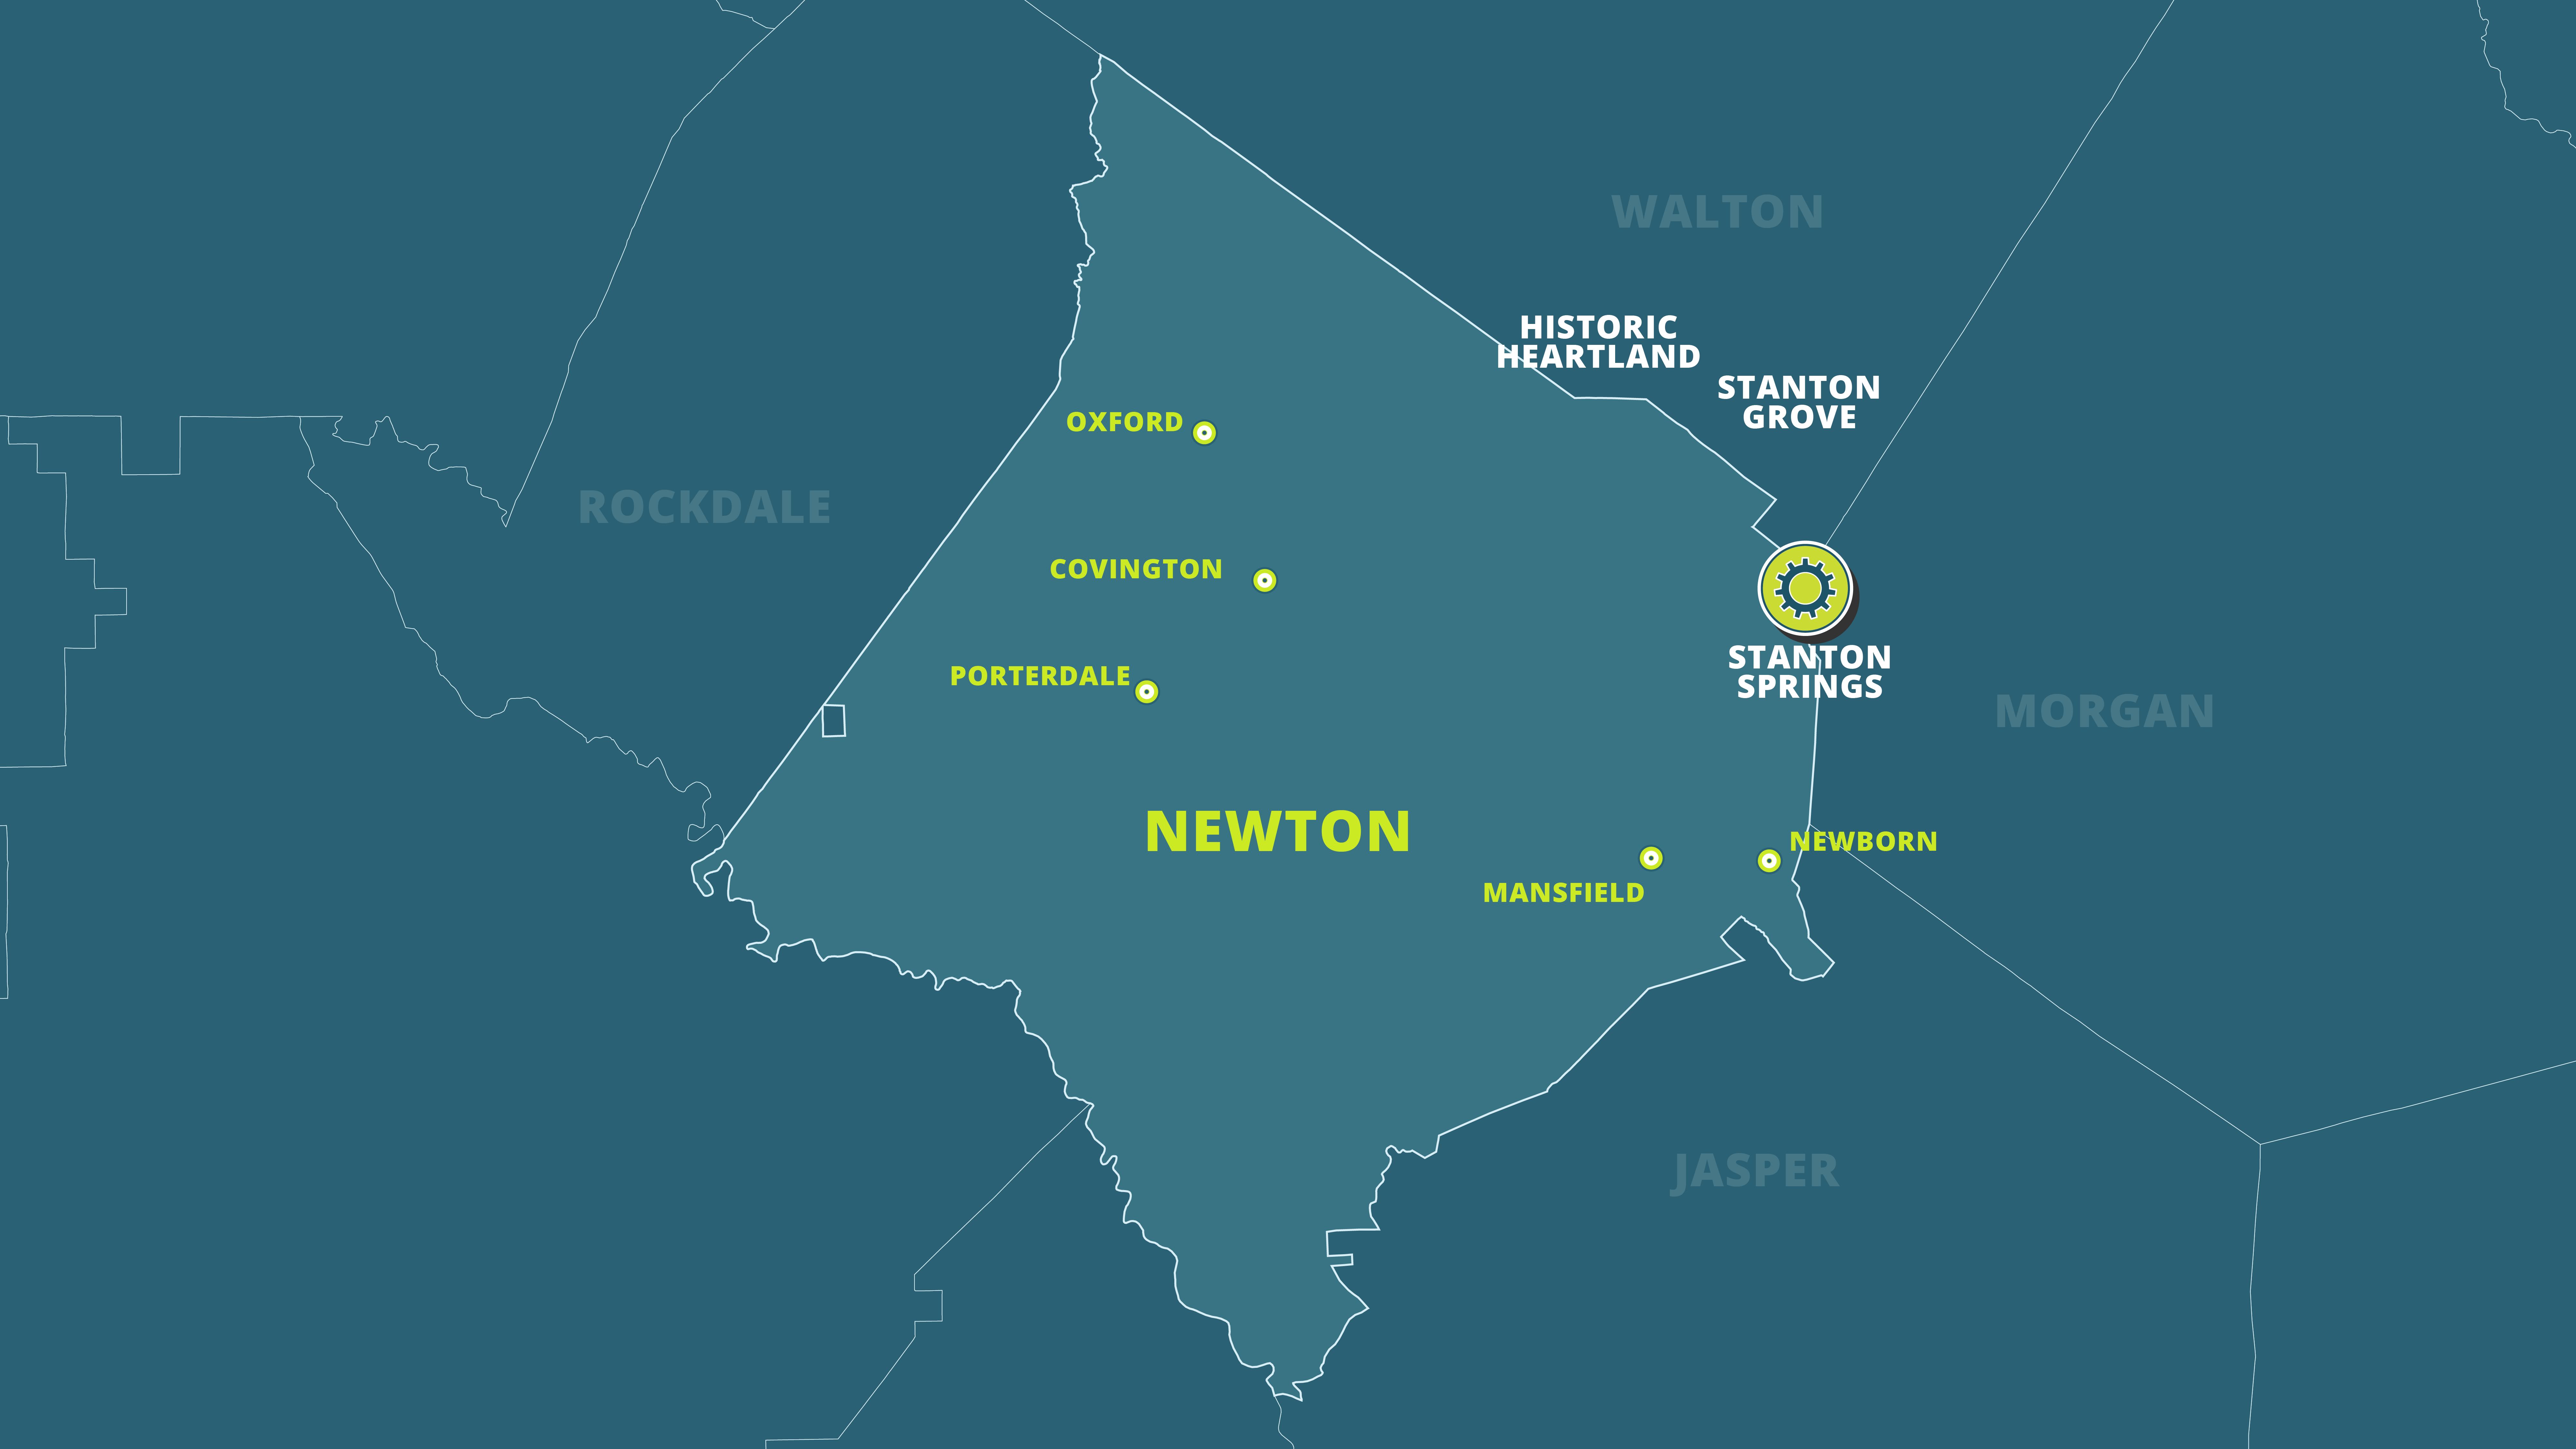 Newton Covington Economic Development   Megasites - Newton ... on city of covington tx, fairfax county ga map, city in atlanta georgia 1939, madison county ga map, floyd county ga map, city street map of covington, city of covington ky, washington county ga map, henry county ga map, franklin ga map, central georgia railroad map, city of covington virginia badge, covington newton county map, montgomery county ga map, city of covington wa, city of covington washington, city of covington la map, city of porterdale ga, lithonia ga map, city of apache junction az map,